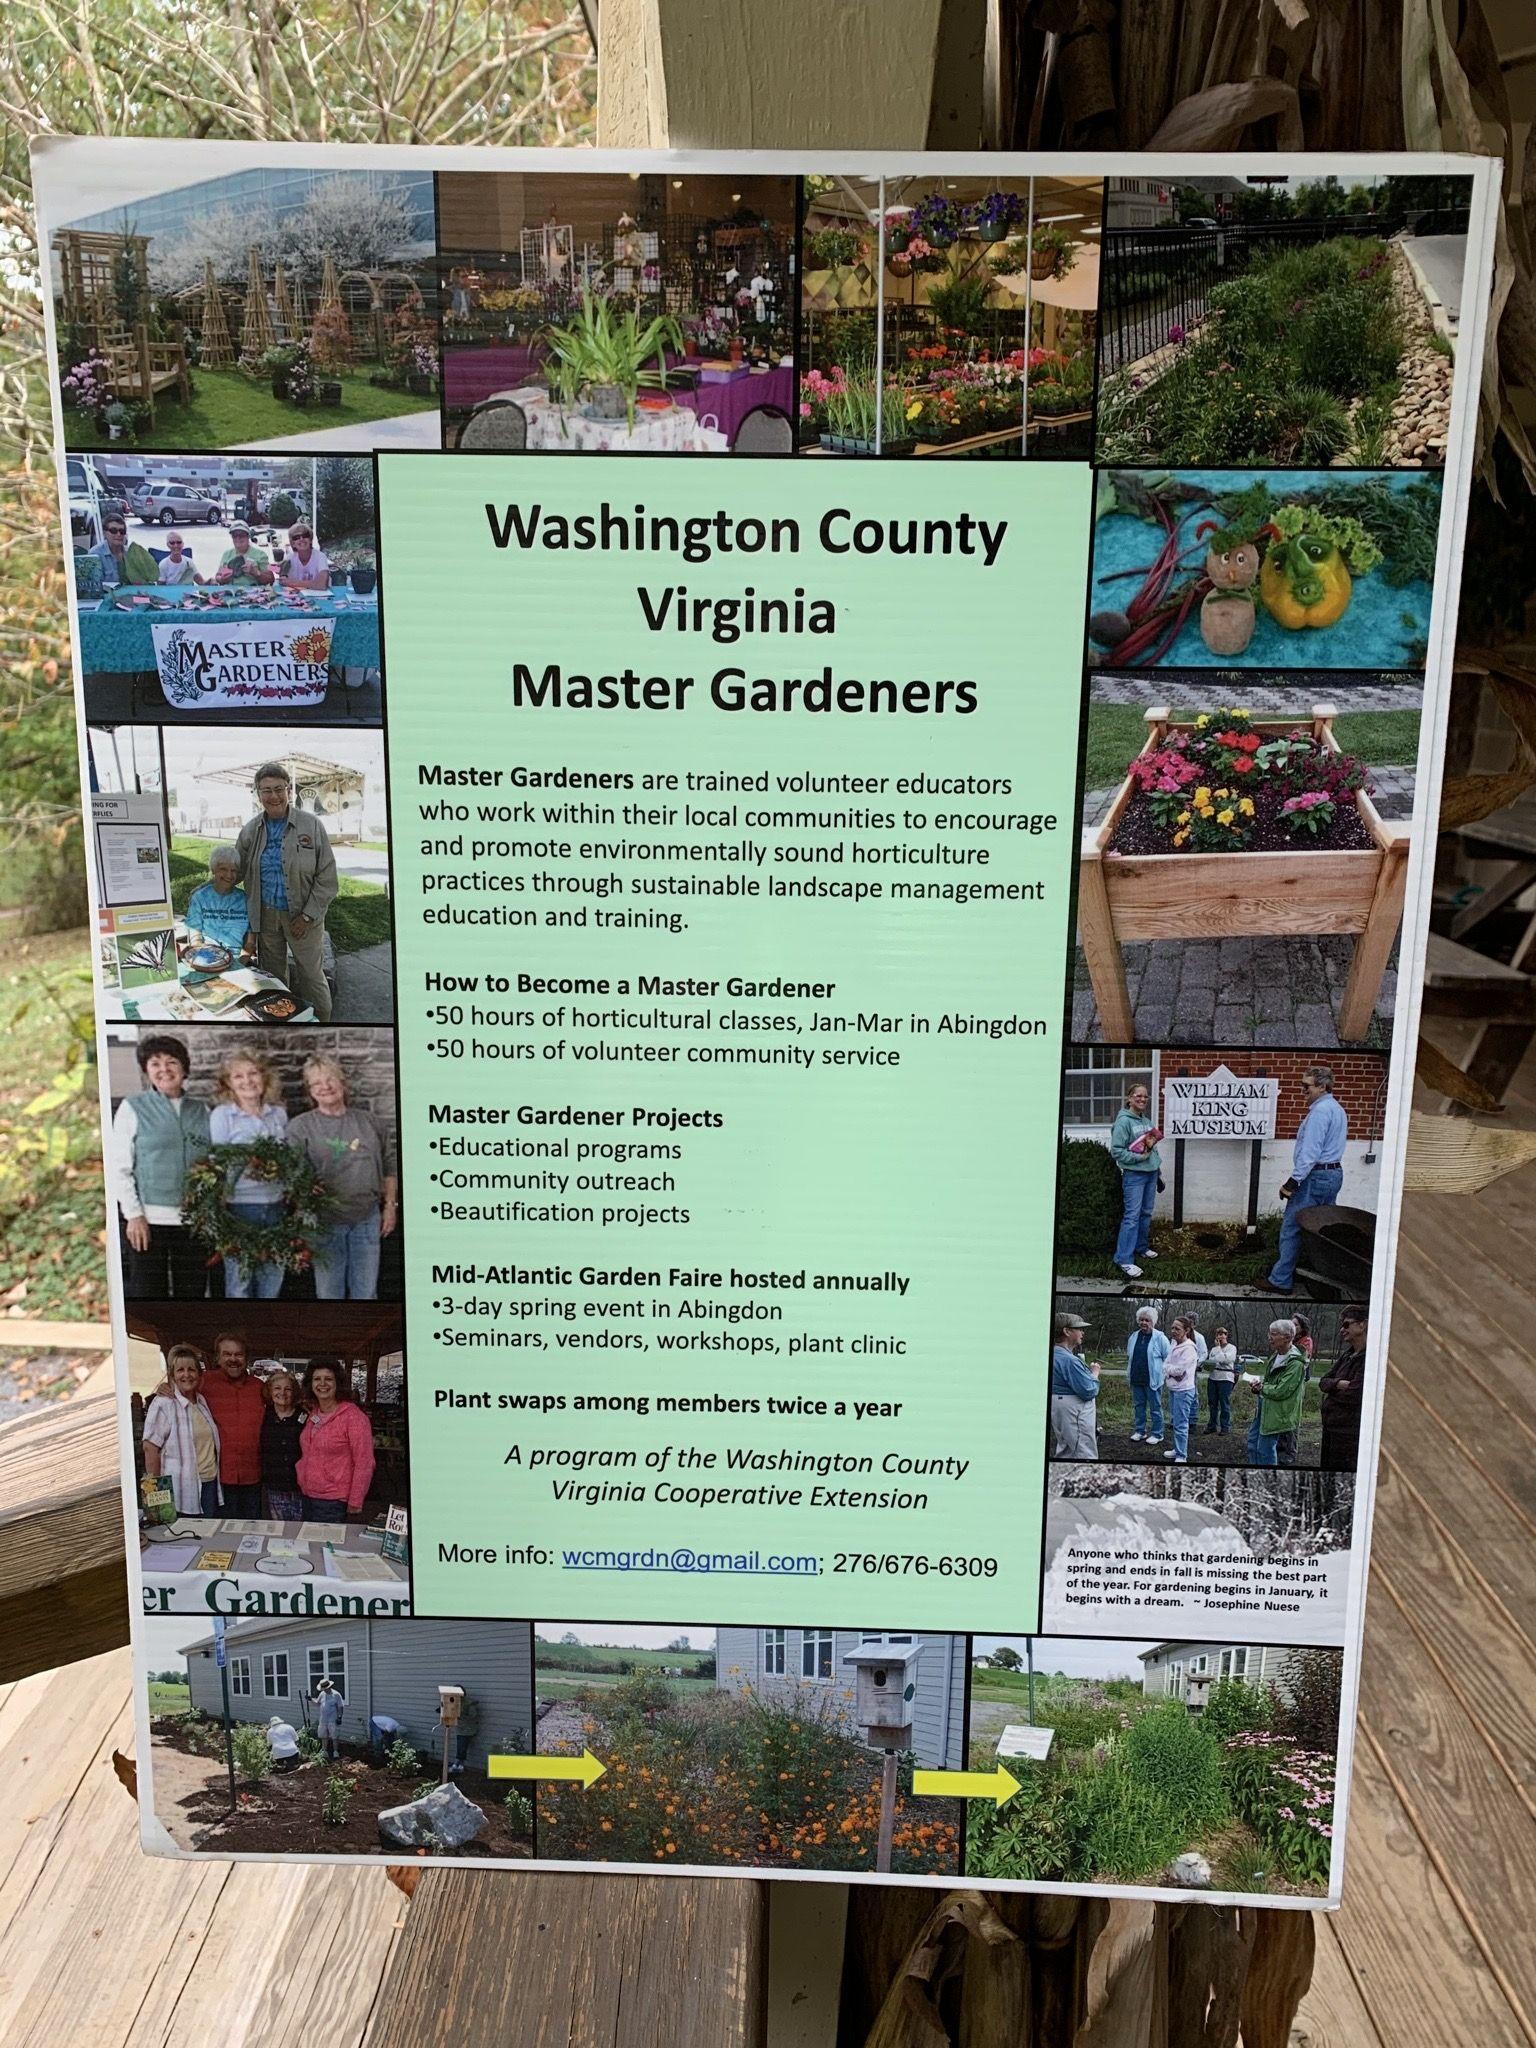 4a79a690b7c724e5d9e46b427e686859 - Washington County Master Gardeners Plant Sale